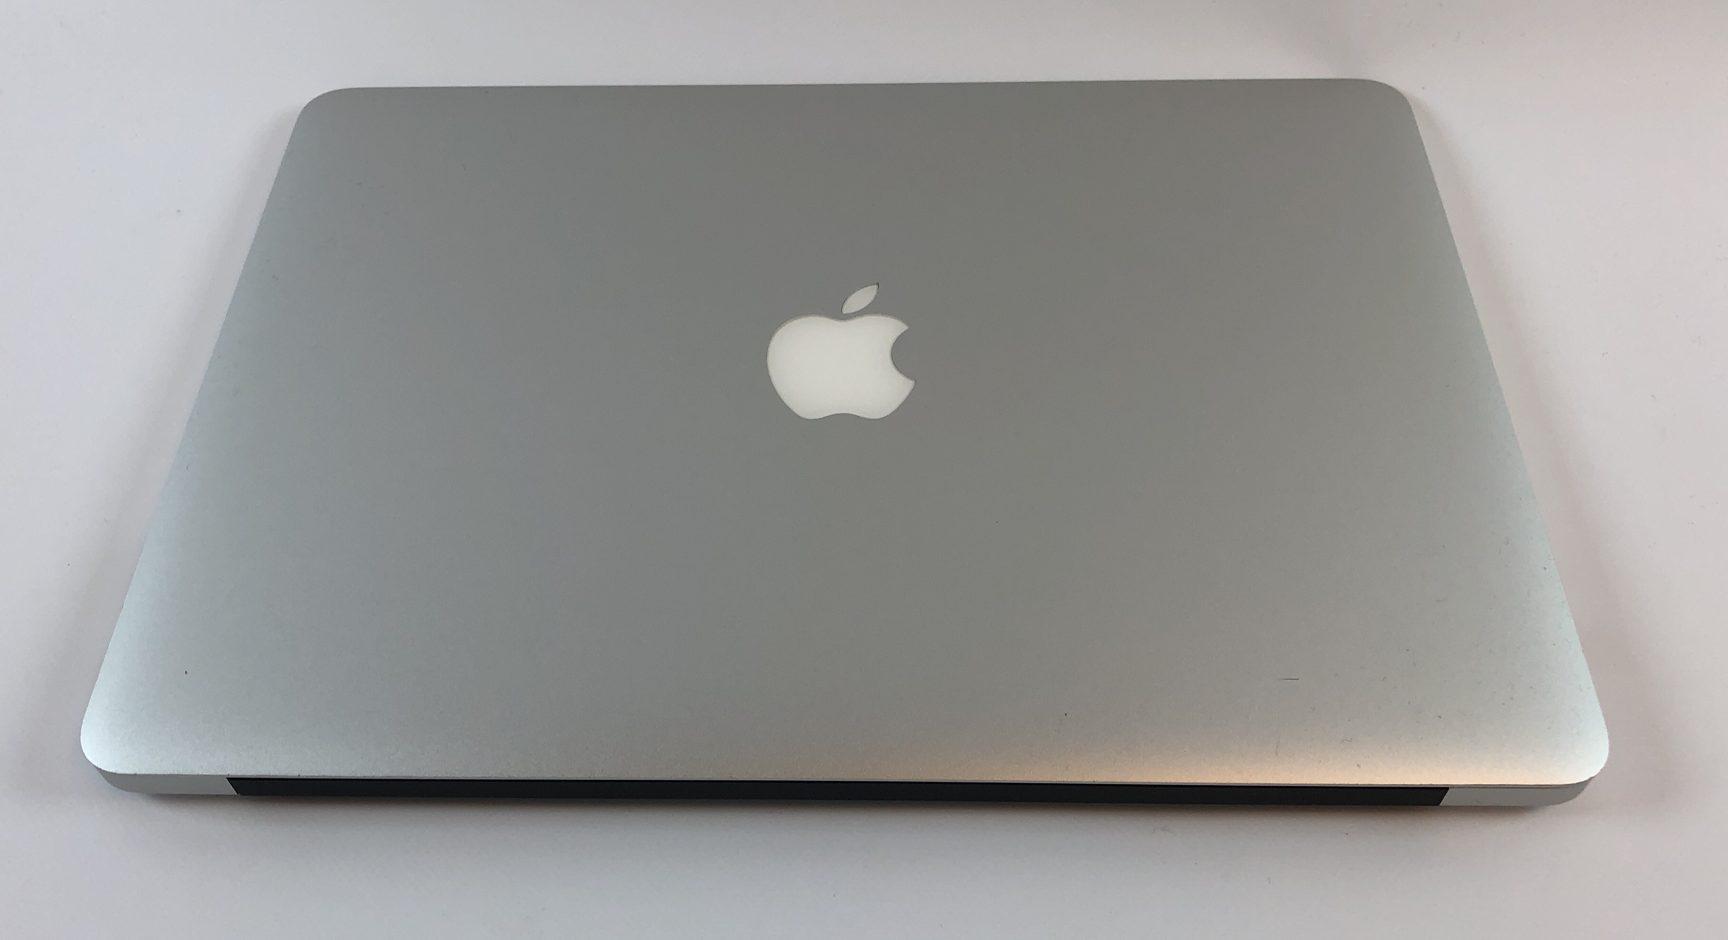 "MacBook Air 13"" Early 2014 (Intel Core i5 1.4 GHz 4 GB RAM 512 GB SSD), Intel Core i5 1.4 GHz, 4 GB RAM, 512 GB SSD, Afbeelding 2"